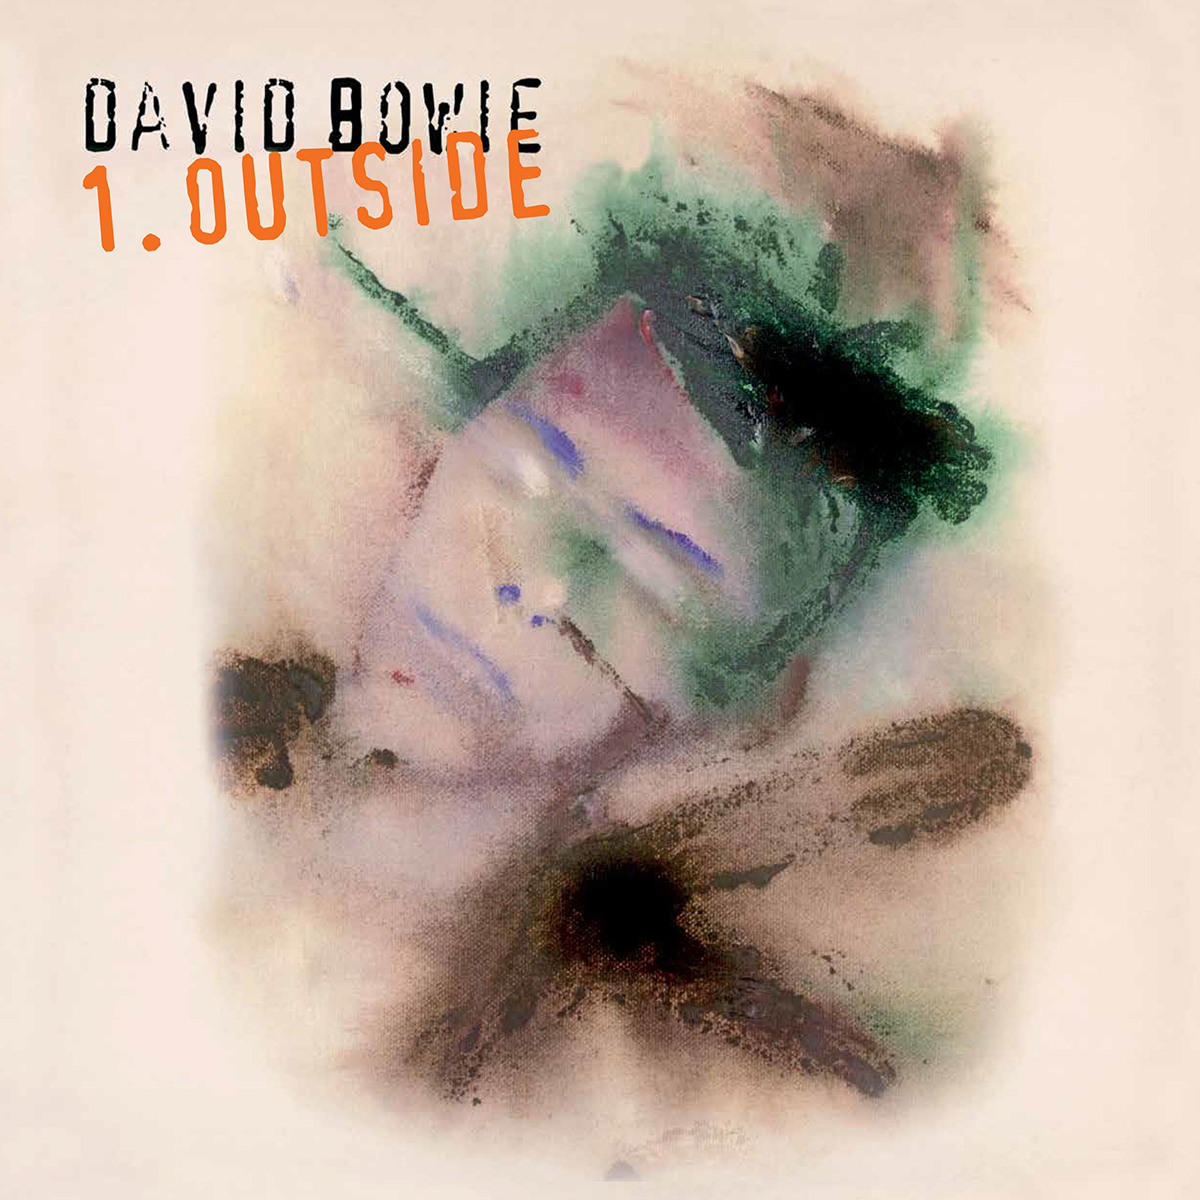 David Bowie - 1. OUTSIDE (180 GRAM AUDIOPHILE TRANSLUCENT BLUE & GREEN SWIRL VINYL/LIMITED EDITION) LP